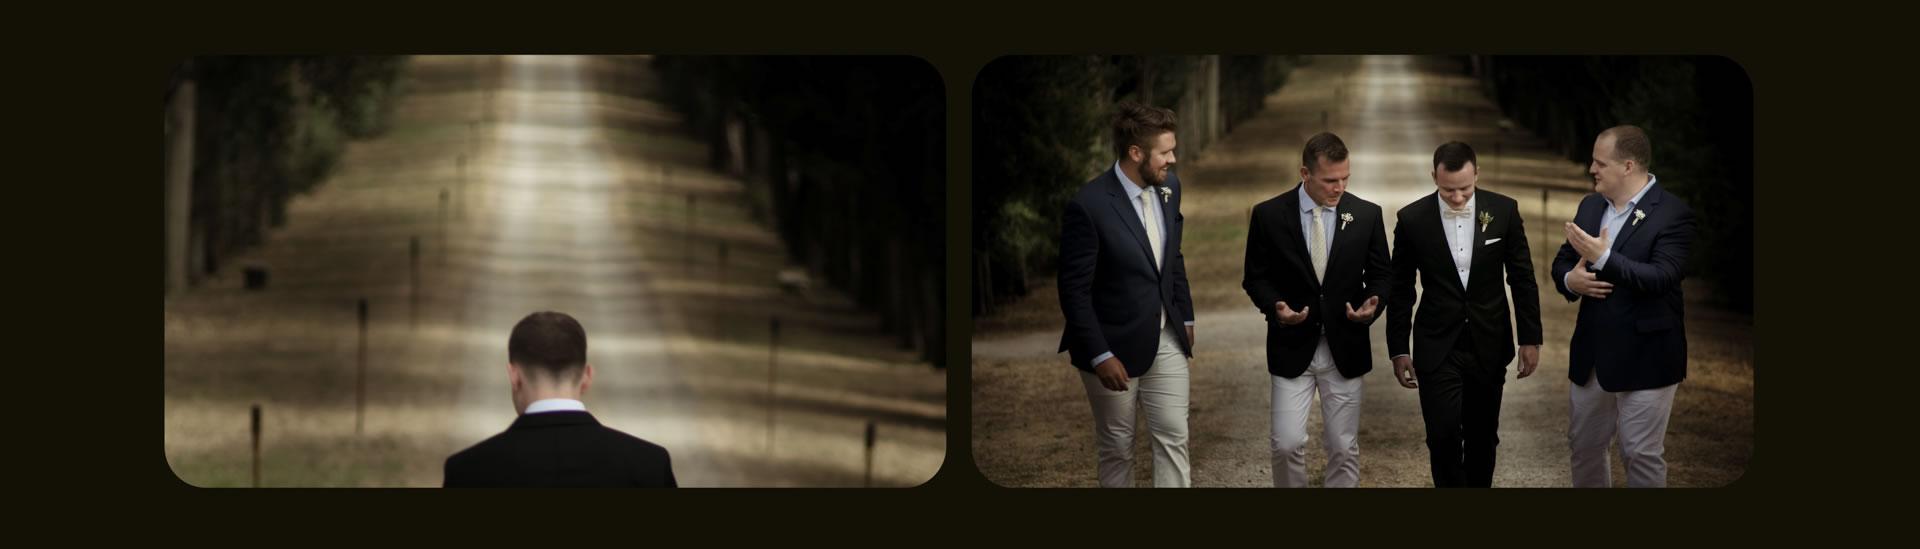 borgo-stomennano-david-bastianoni-photographer-00018 - 18 :: Wedding at Borgo Stomennano // WPPI 2018 // Our love is here to stay :: Luxury wedding photography - 17 :: borgo-stomennano-david-bastianoni-photographer-00018 - 18